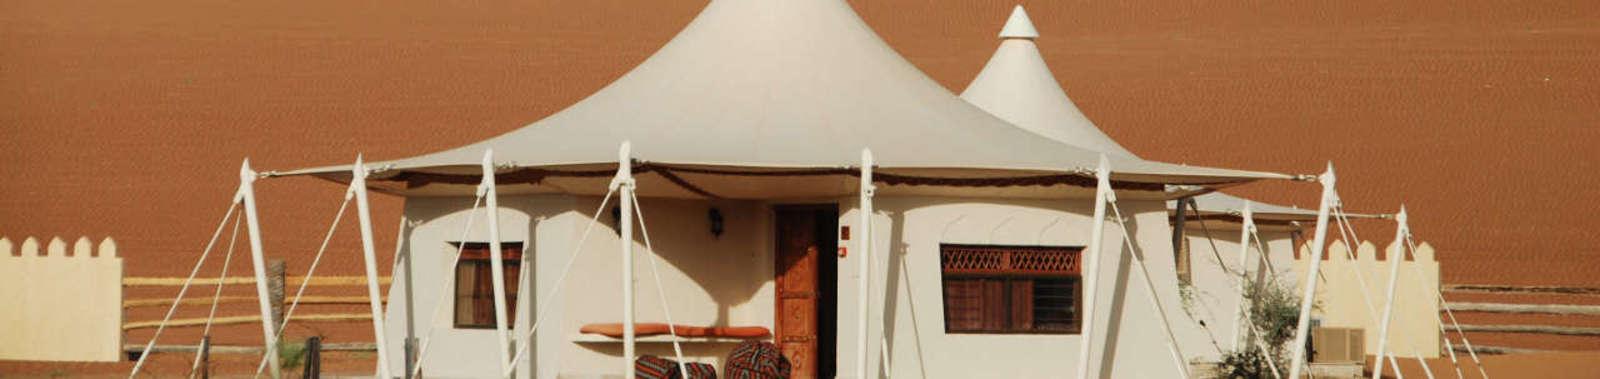 Desert-Nights-Camp-Oman-12